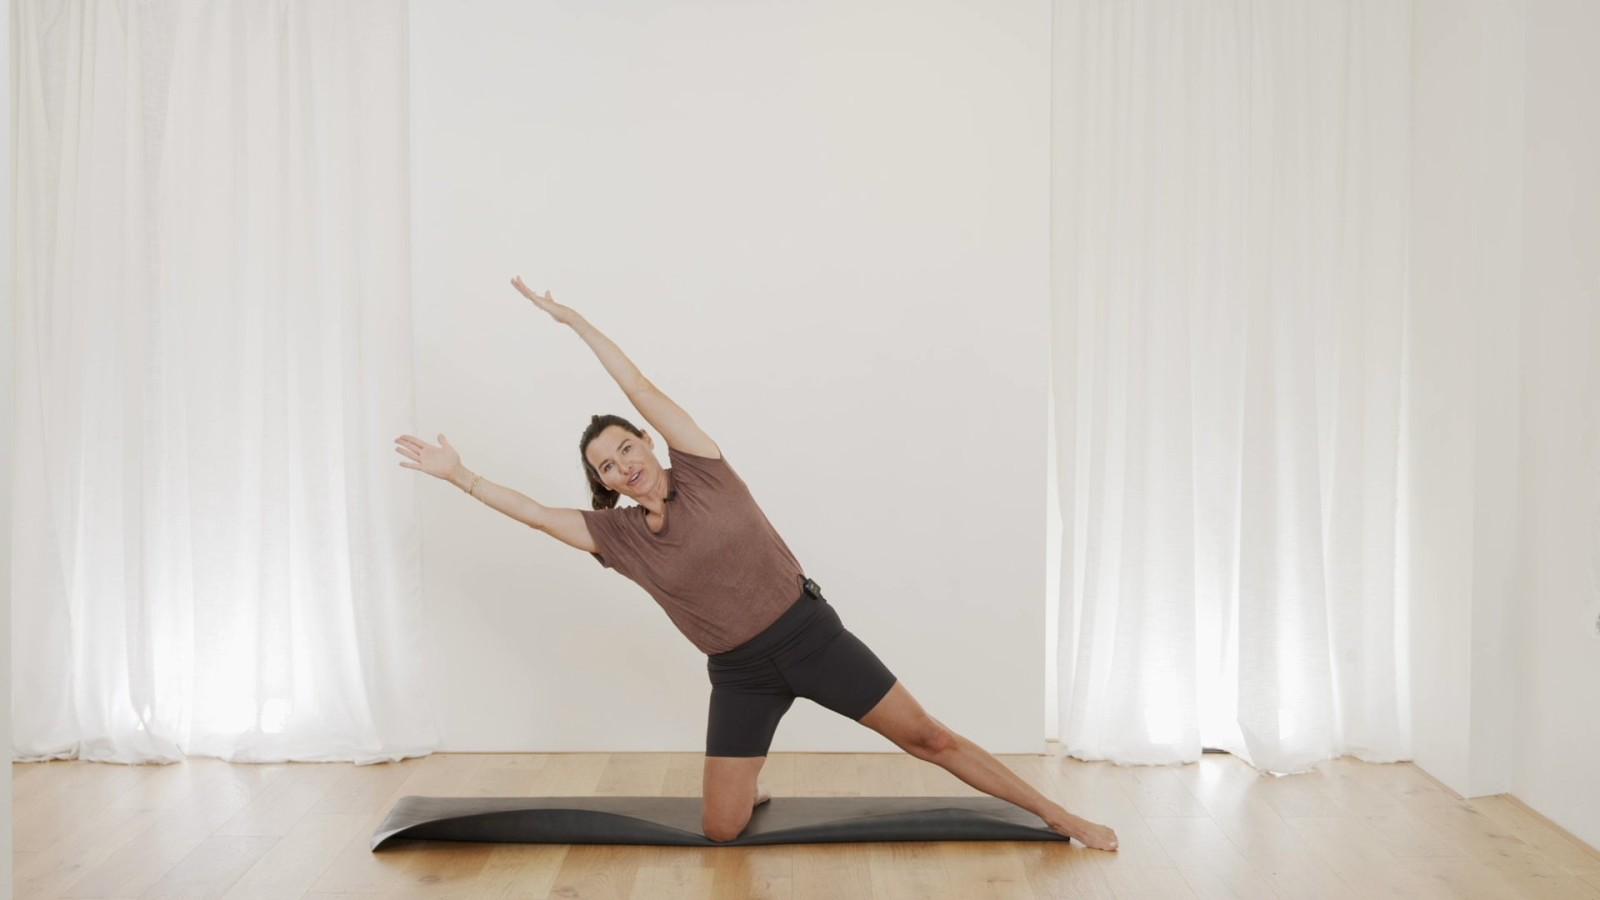 Pilates Morning Flow 2 with Aneta Bachanova